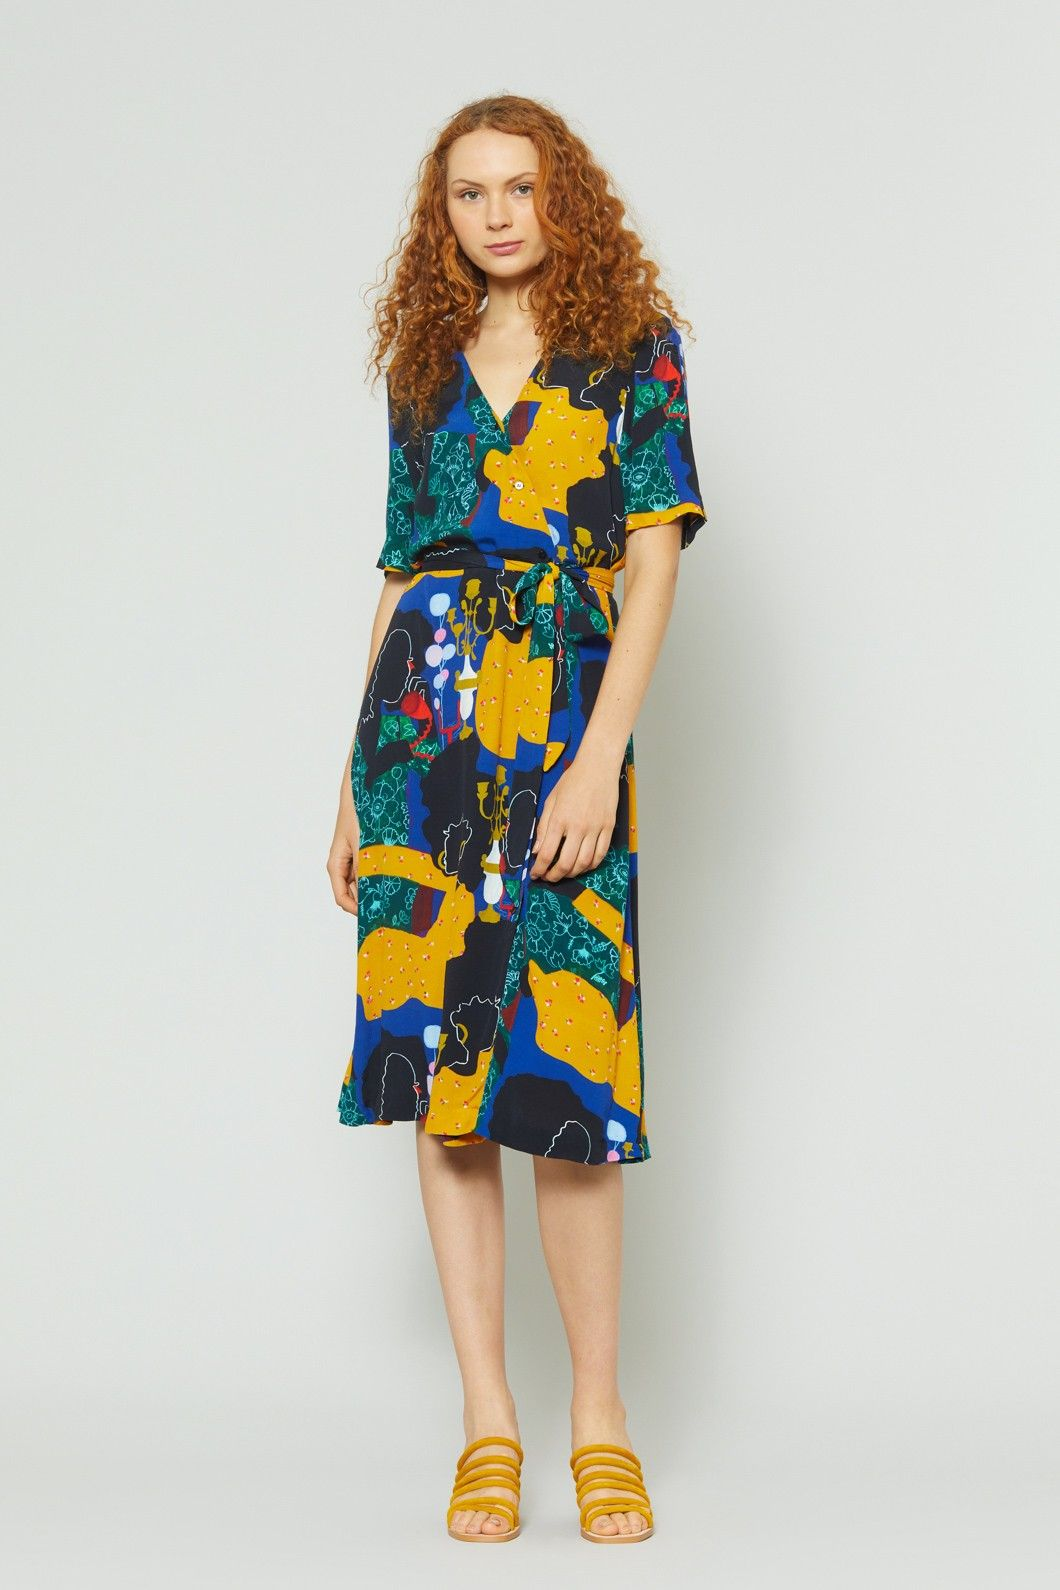 00a6089d4e Gorman Online    Dial Up Wrap Dress - Jamilla Okubo x Gorman - Shop ...